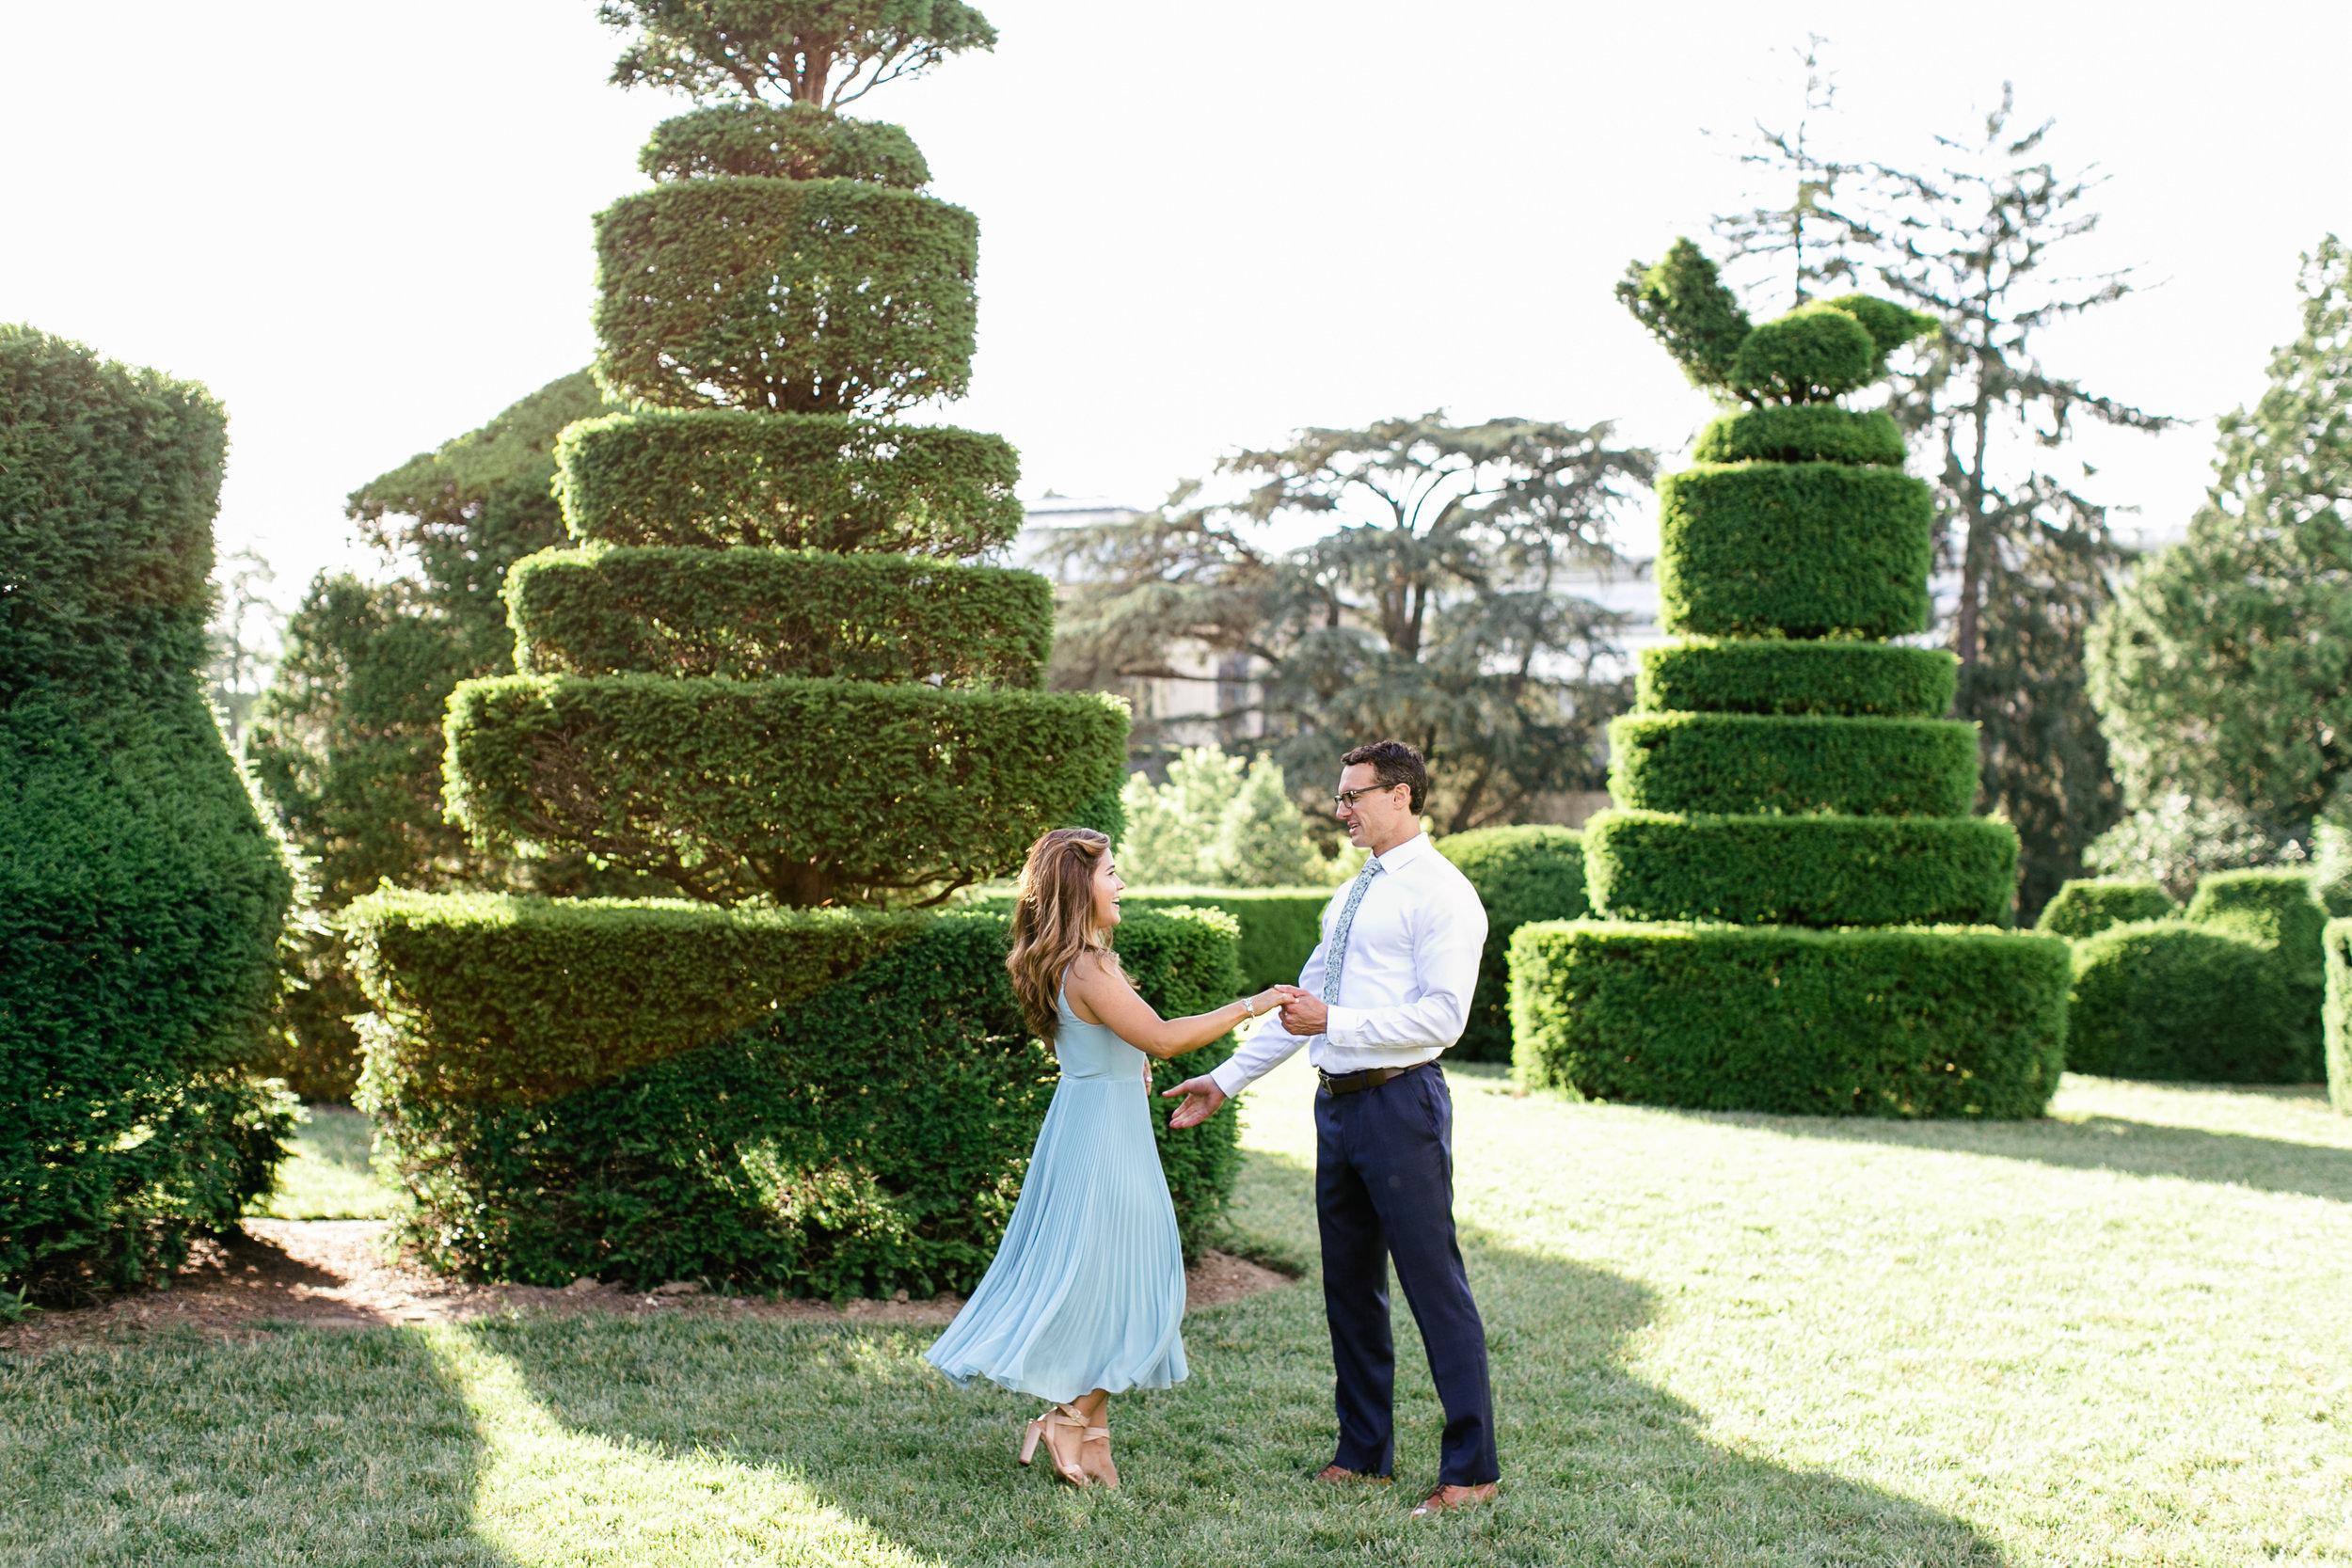 photography-natural-candid-engaged-proposal-philadelphia-wedding-longwood gardends-nature-flowers-modern-lifestyle-09.JPG